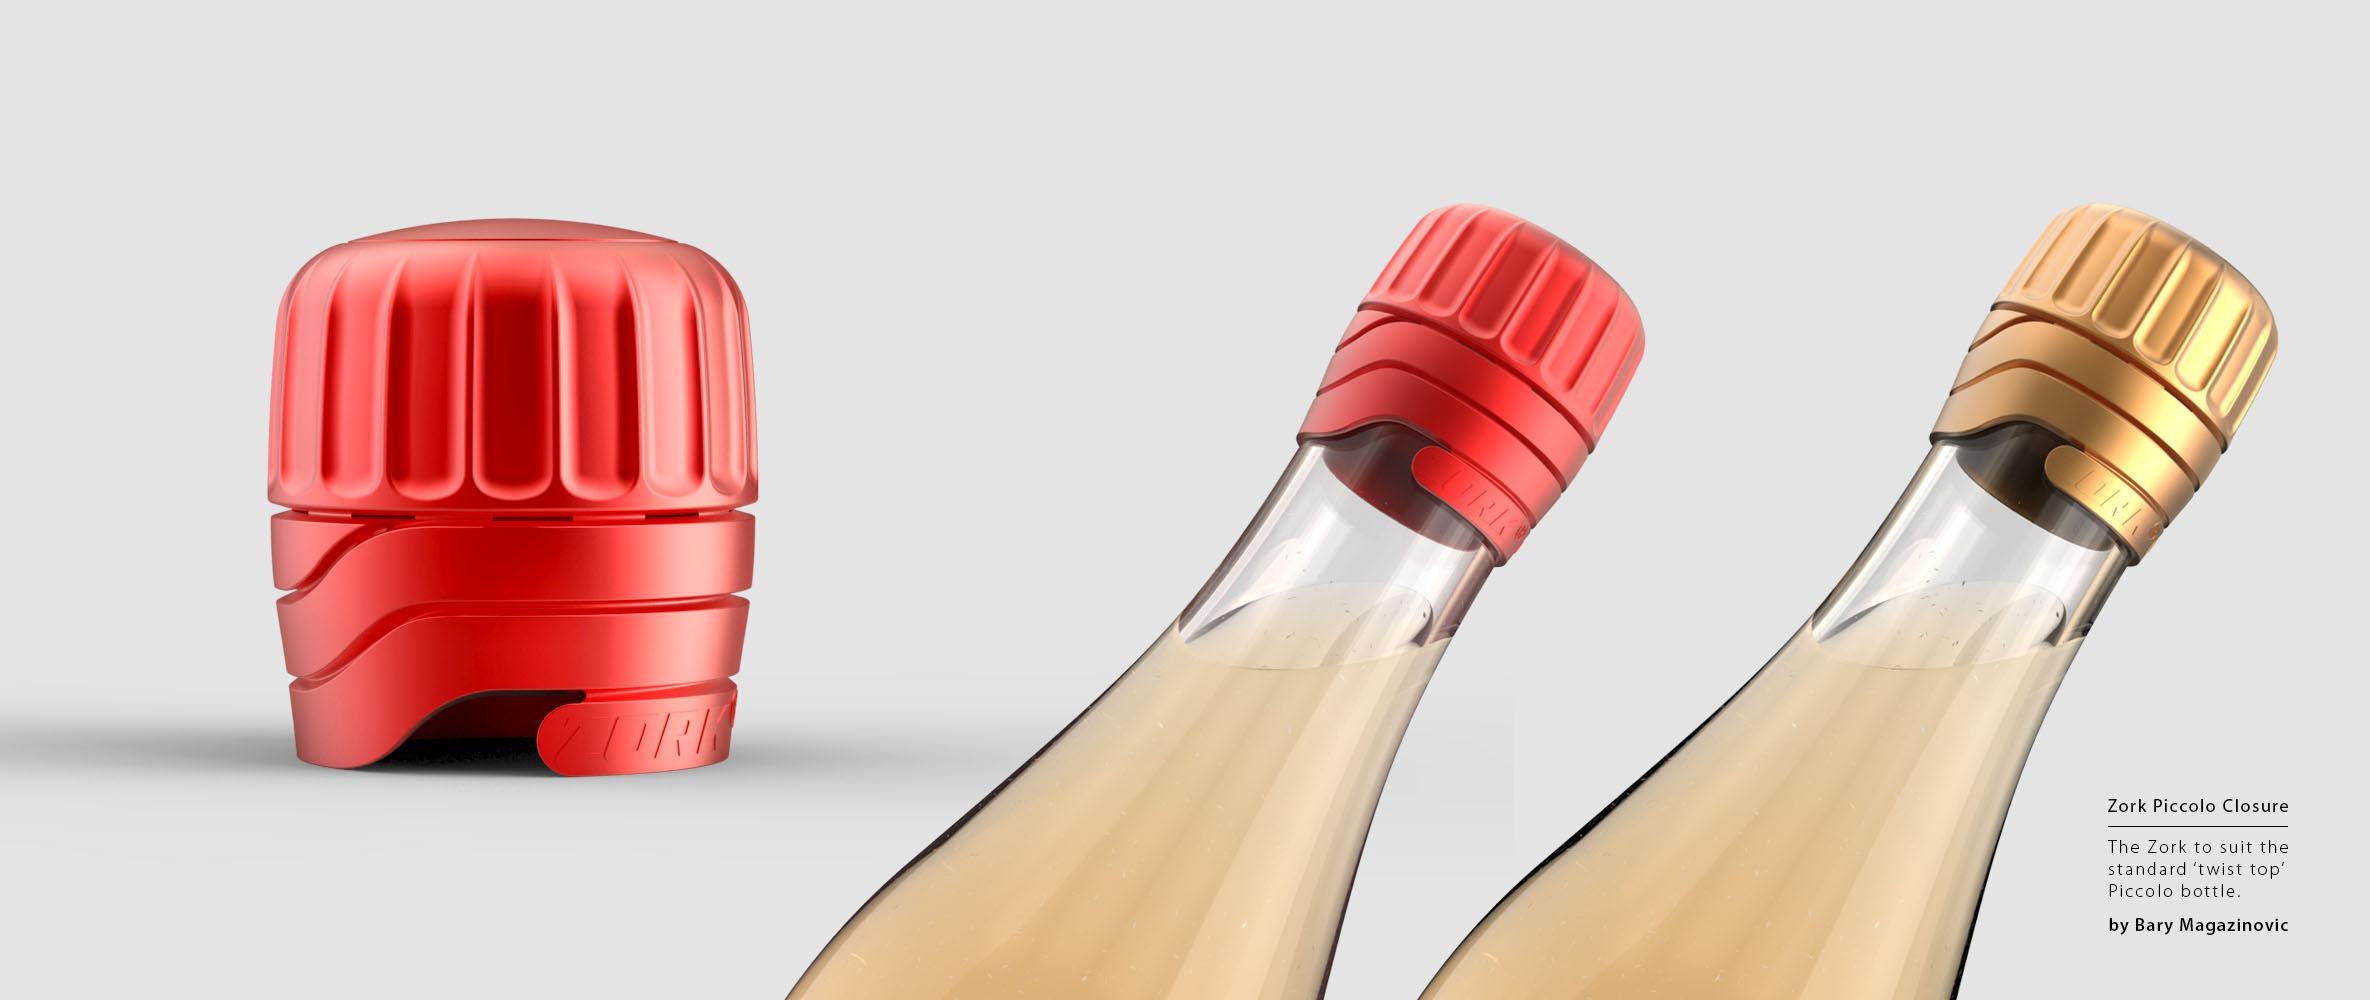 Australian Product Design Industrial Design Zork Wine closure piccolo bottle red wine white wine by Barry Magazinovic